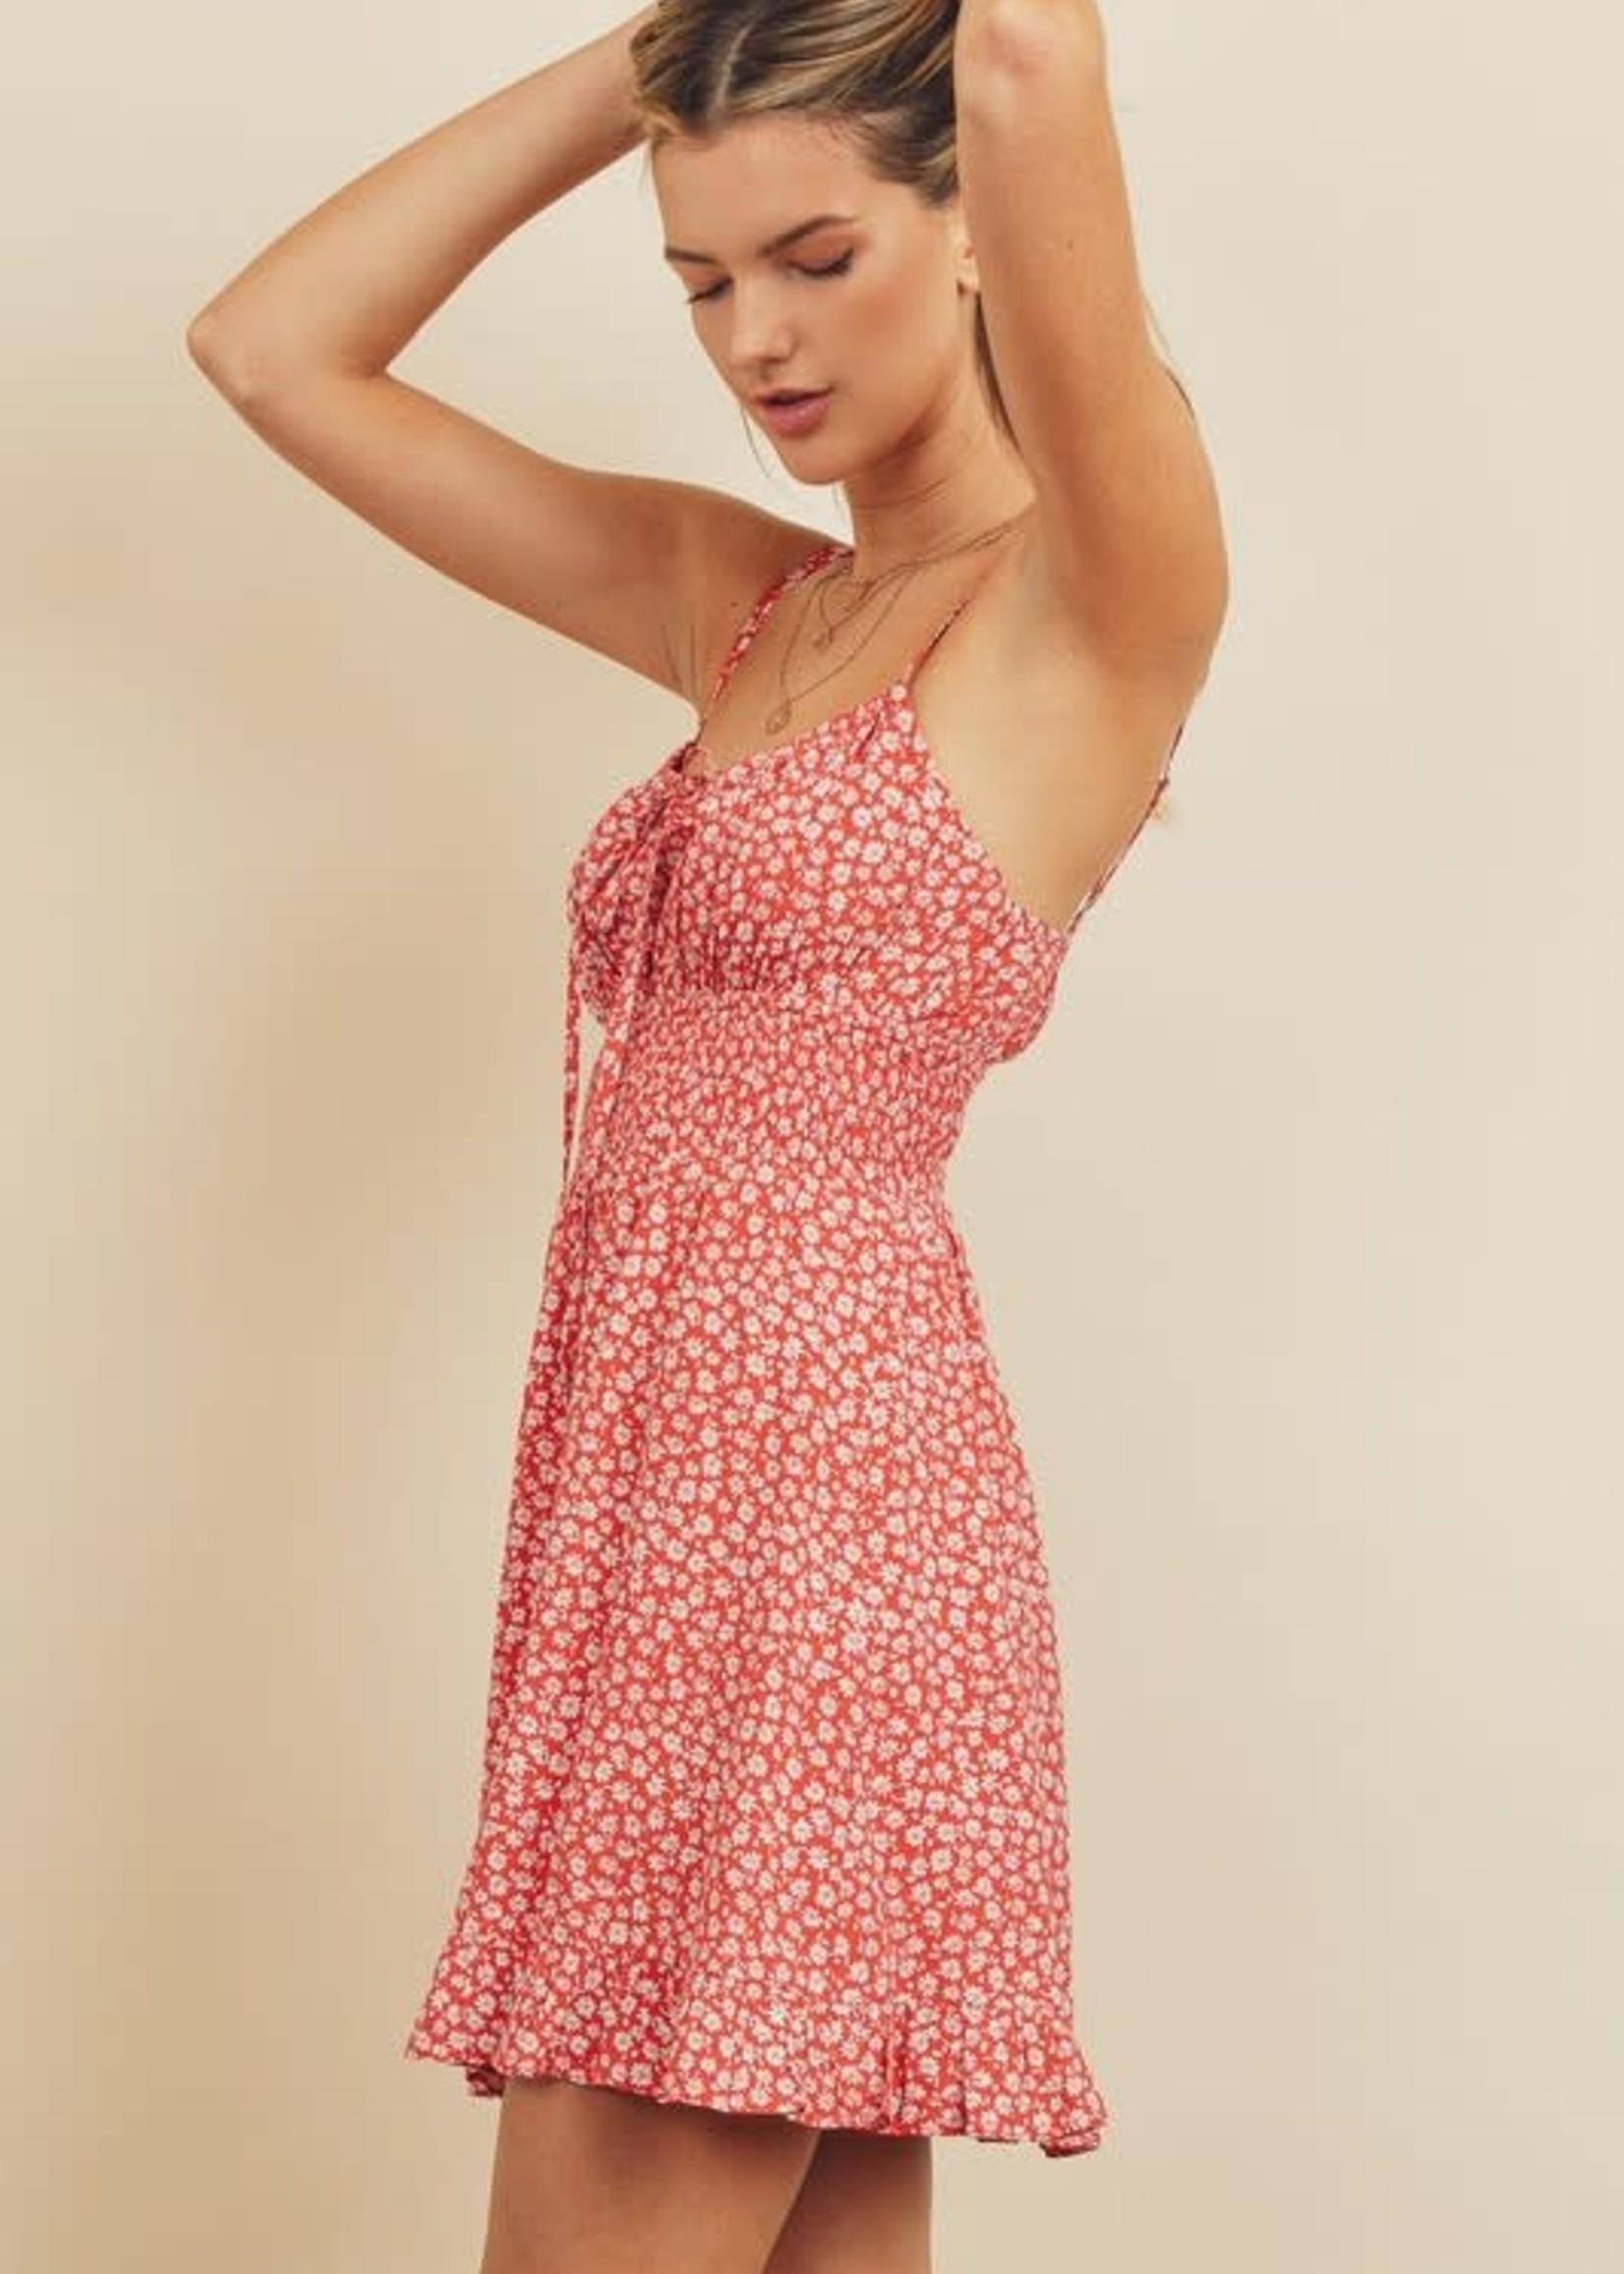 Floral Smocked Waist Dress - Red